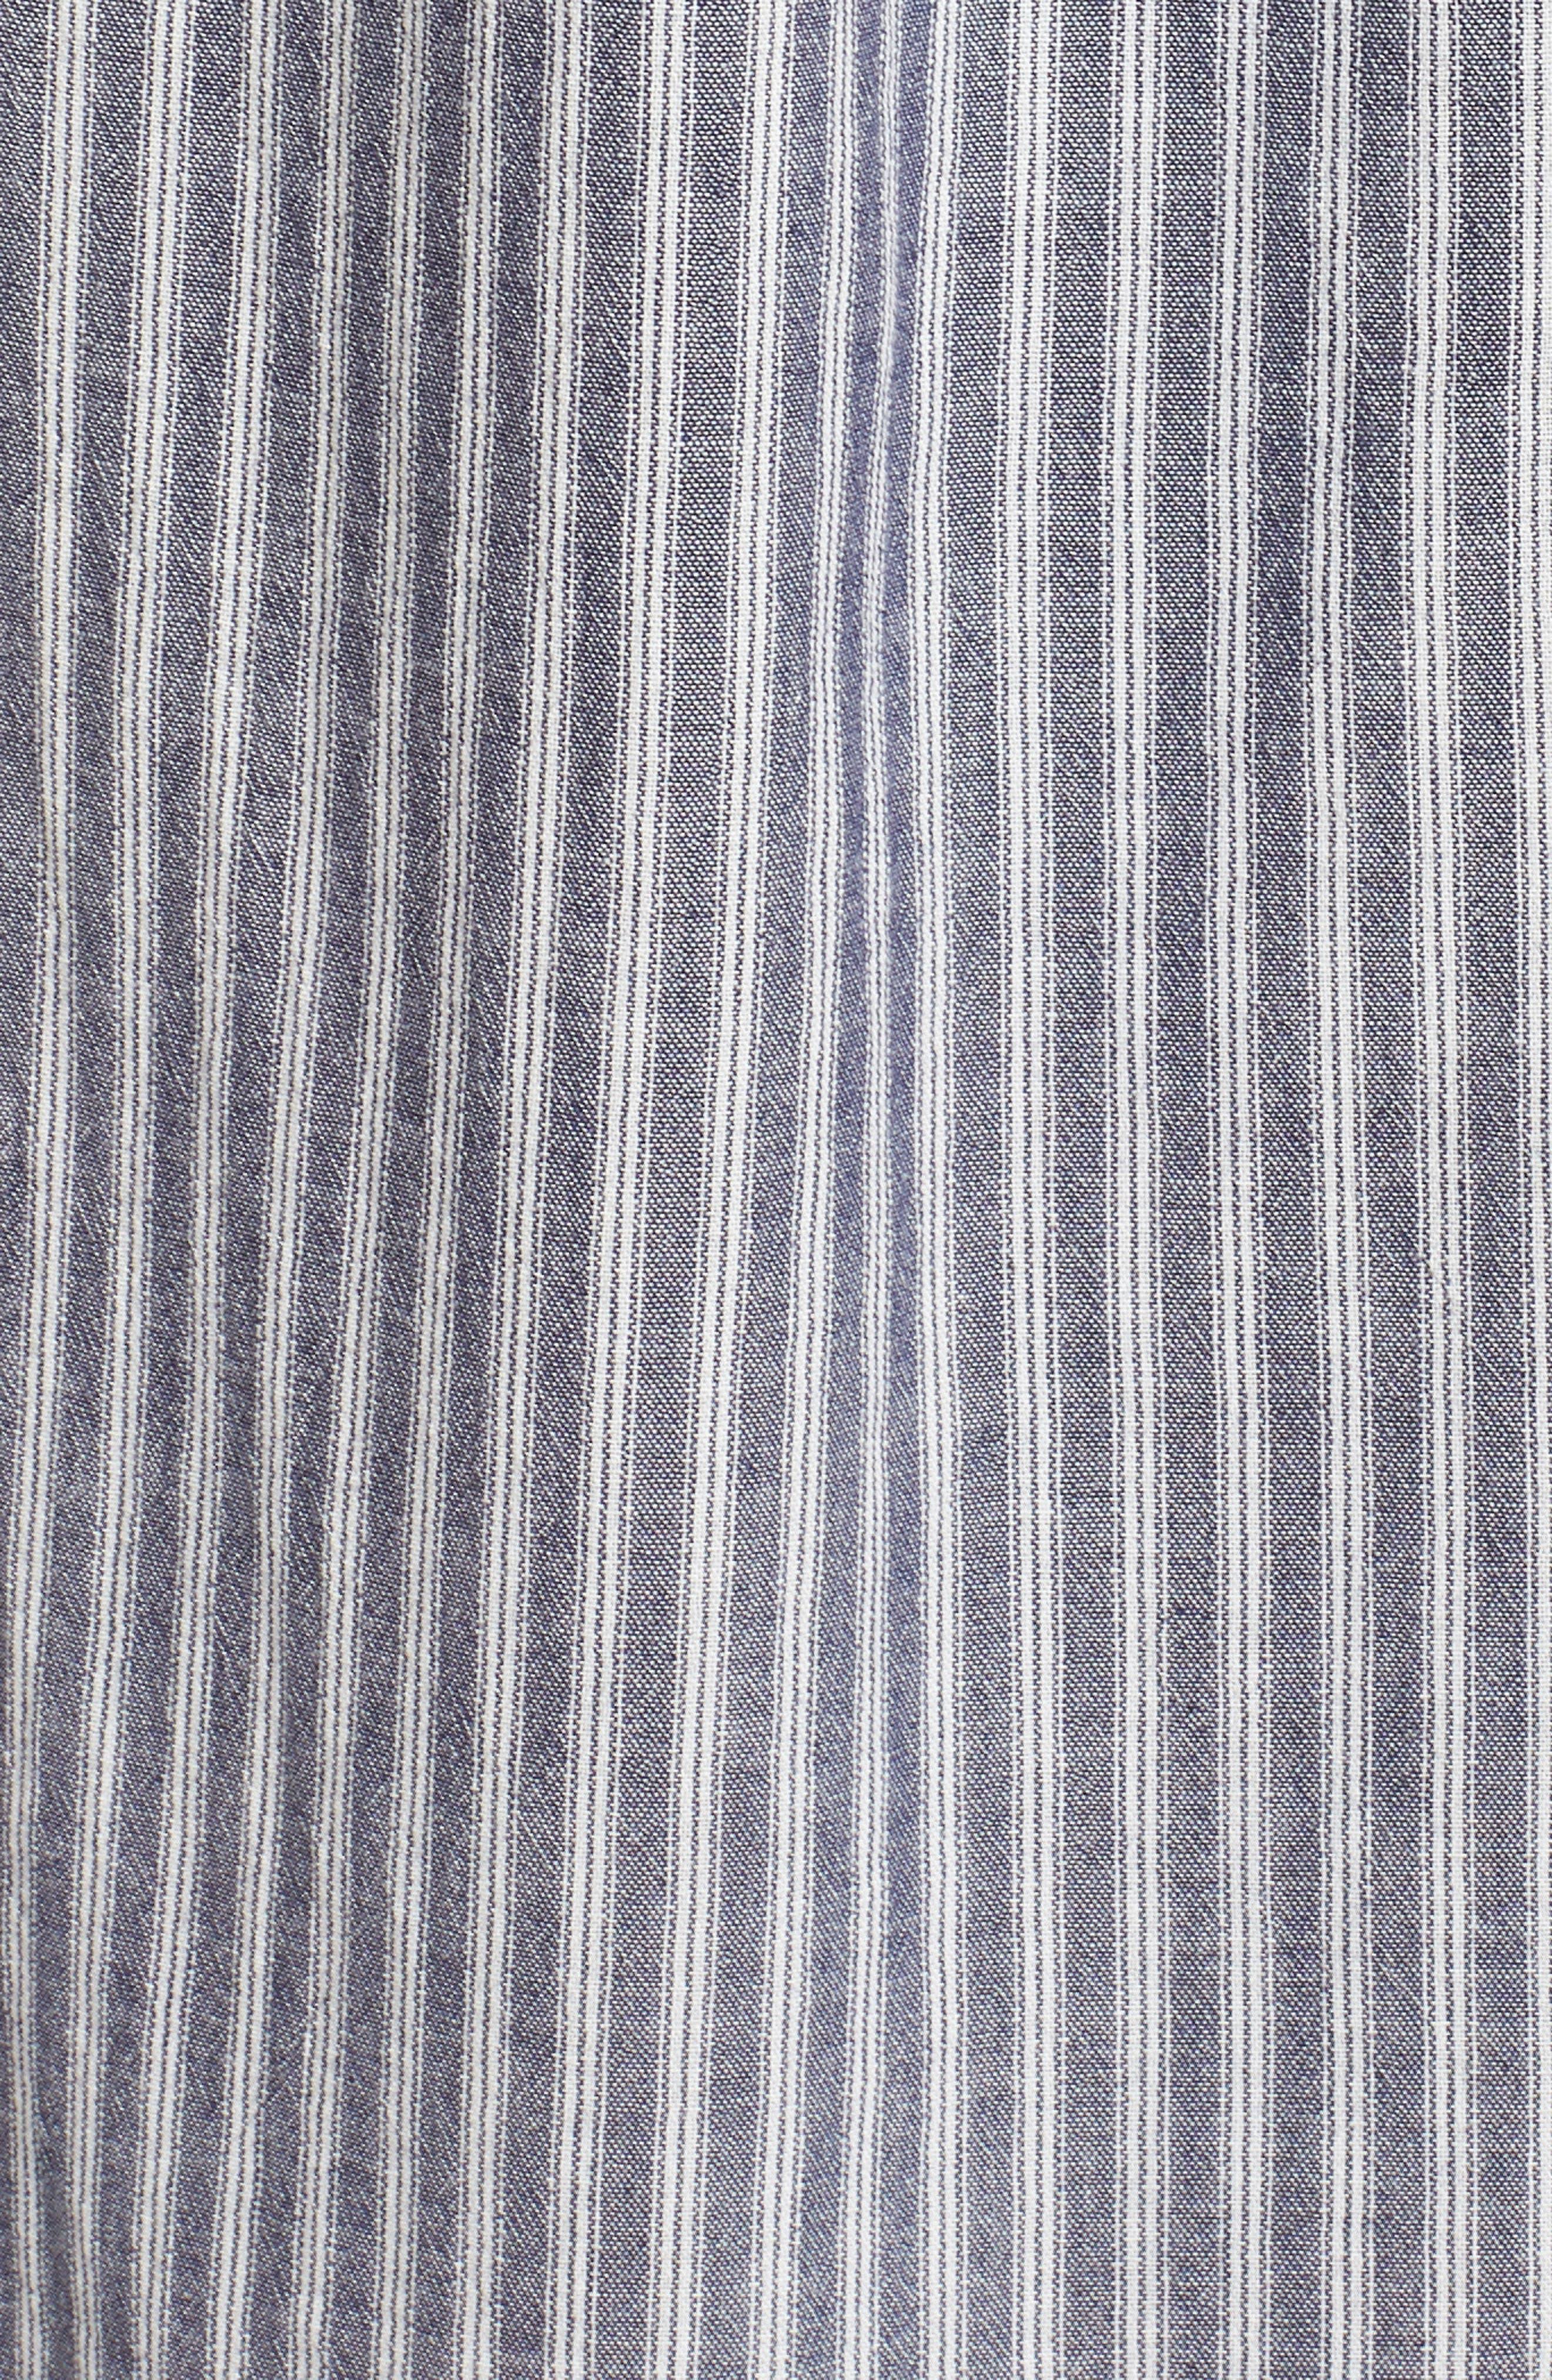 Carmel Smocked Off the Shoulder Maxi Dress,                             Alternate thumbnail 6, color,                             428